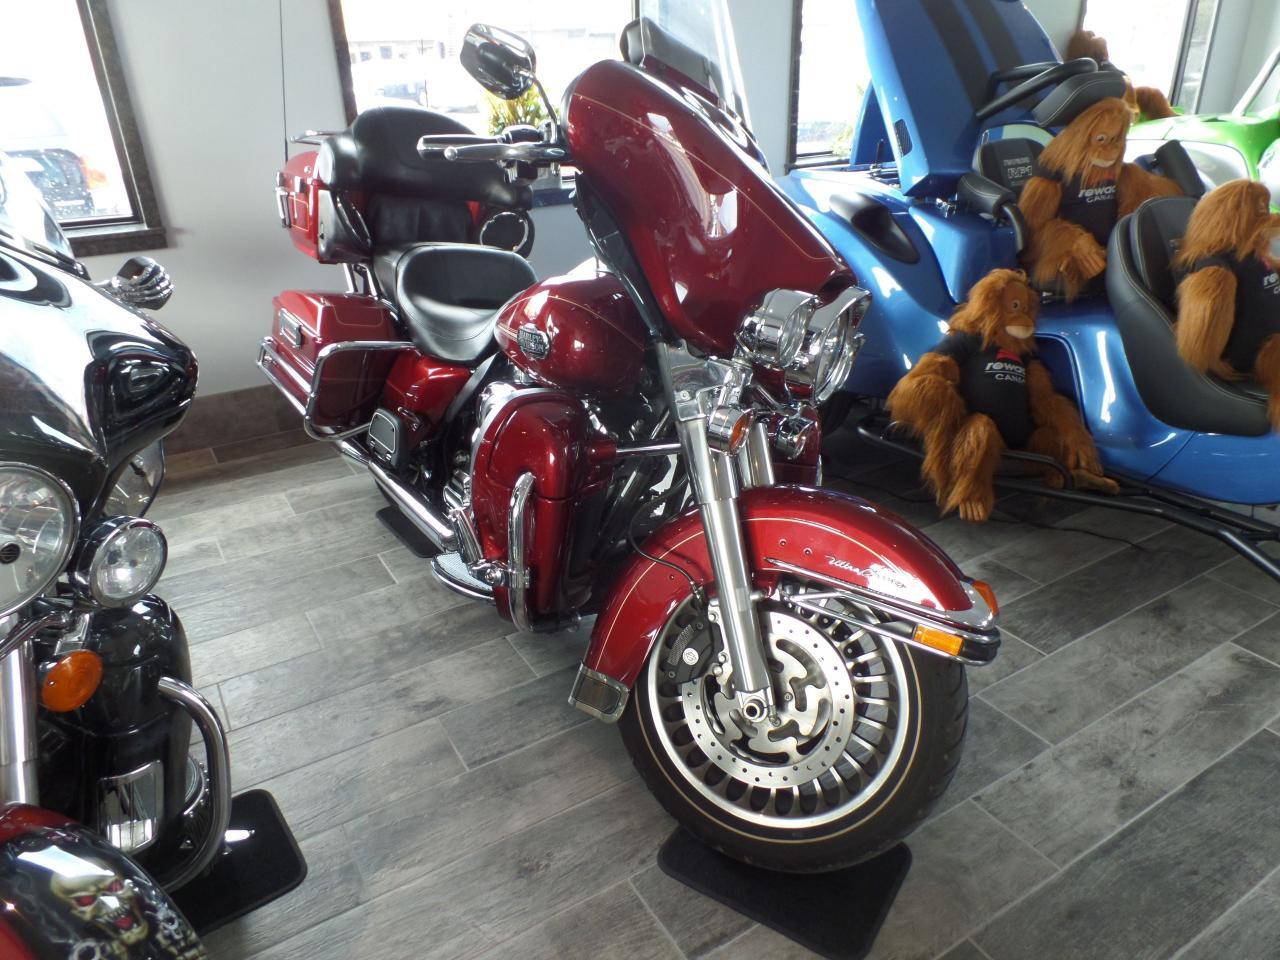 2010 Harley-Davidson Electra Glide Ultra Classic Ltd. Touring